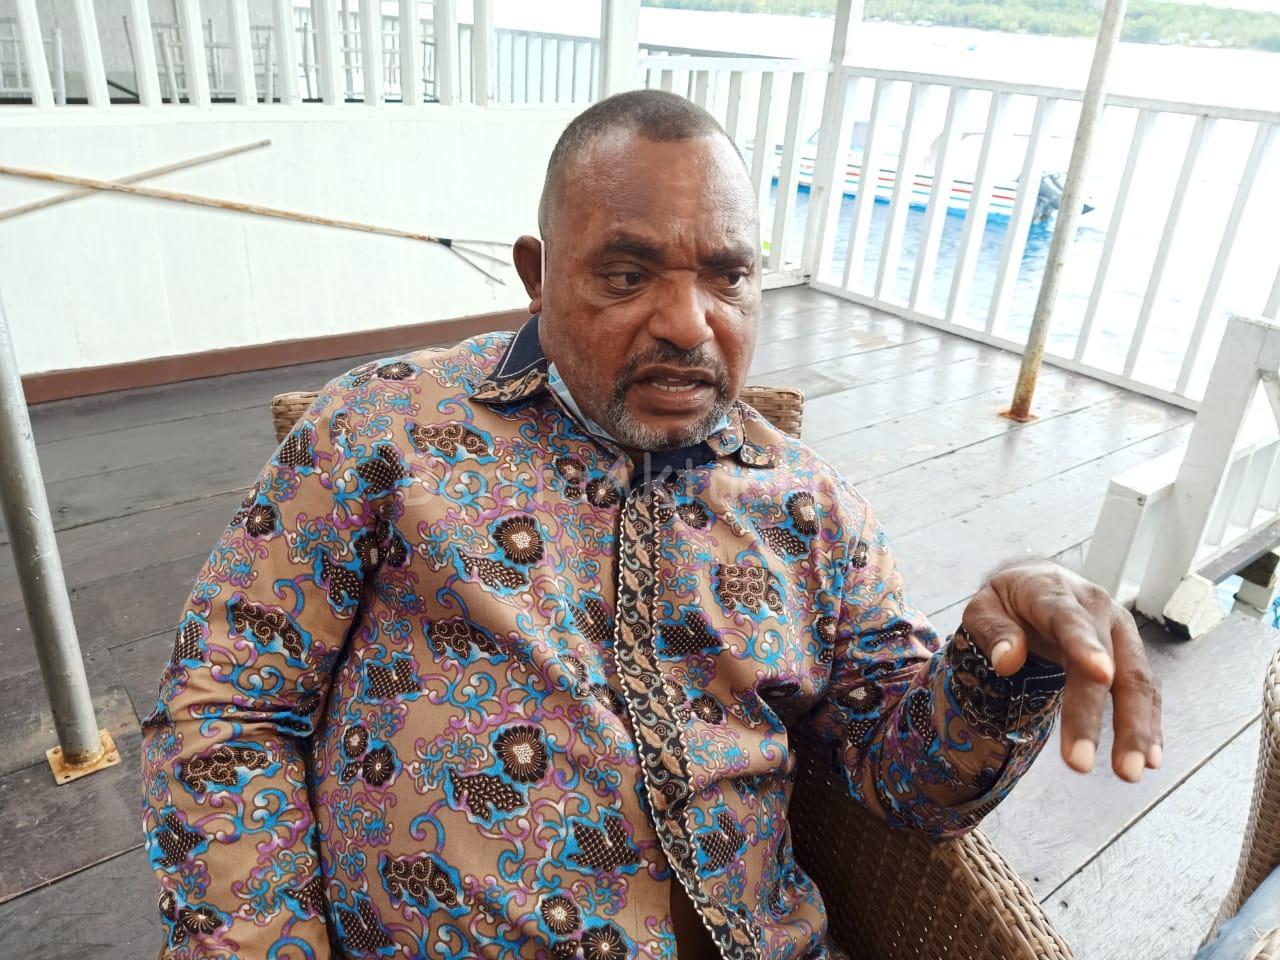 Jimmy Idjie: Kepala Daerah di Papua Barat Harus Contohi Bupati Paniai 25 IMG 20200805 WA0051